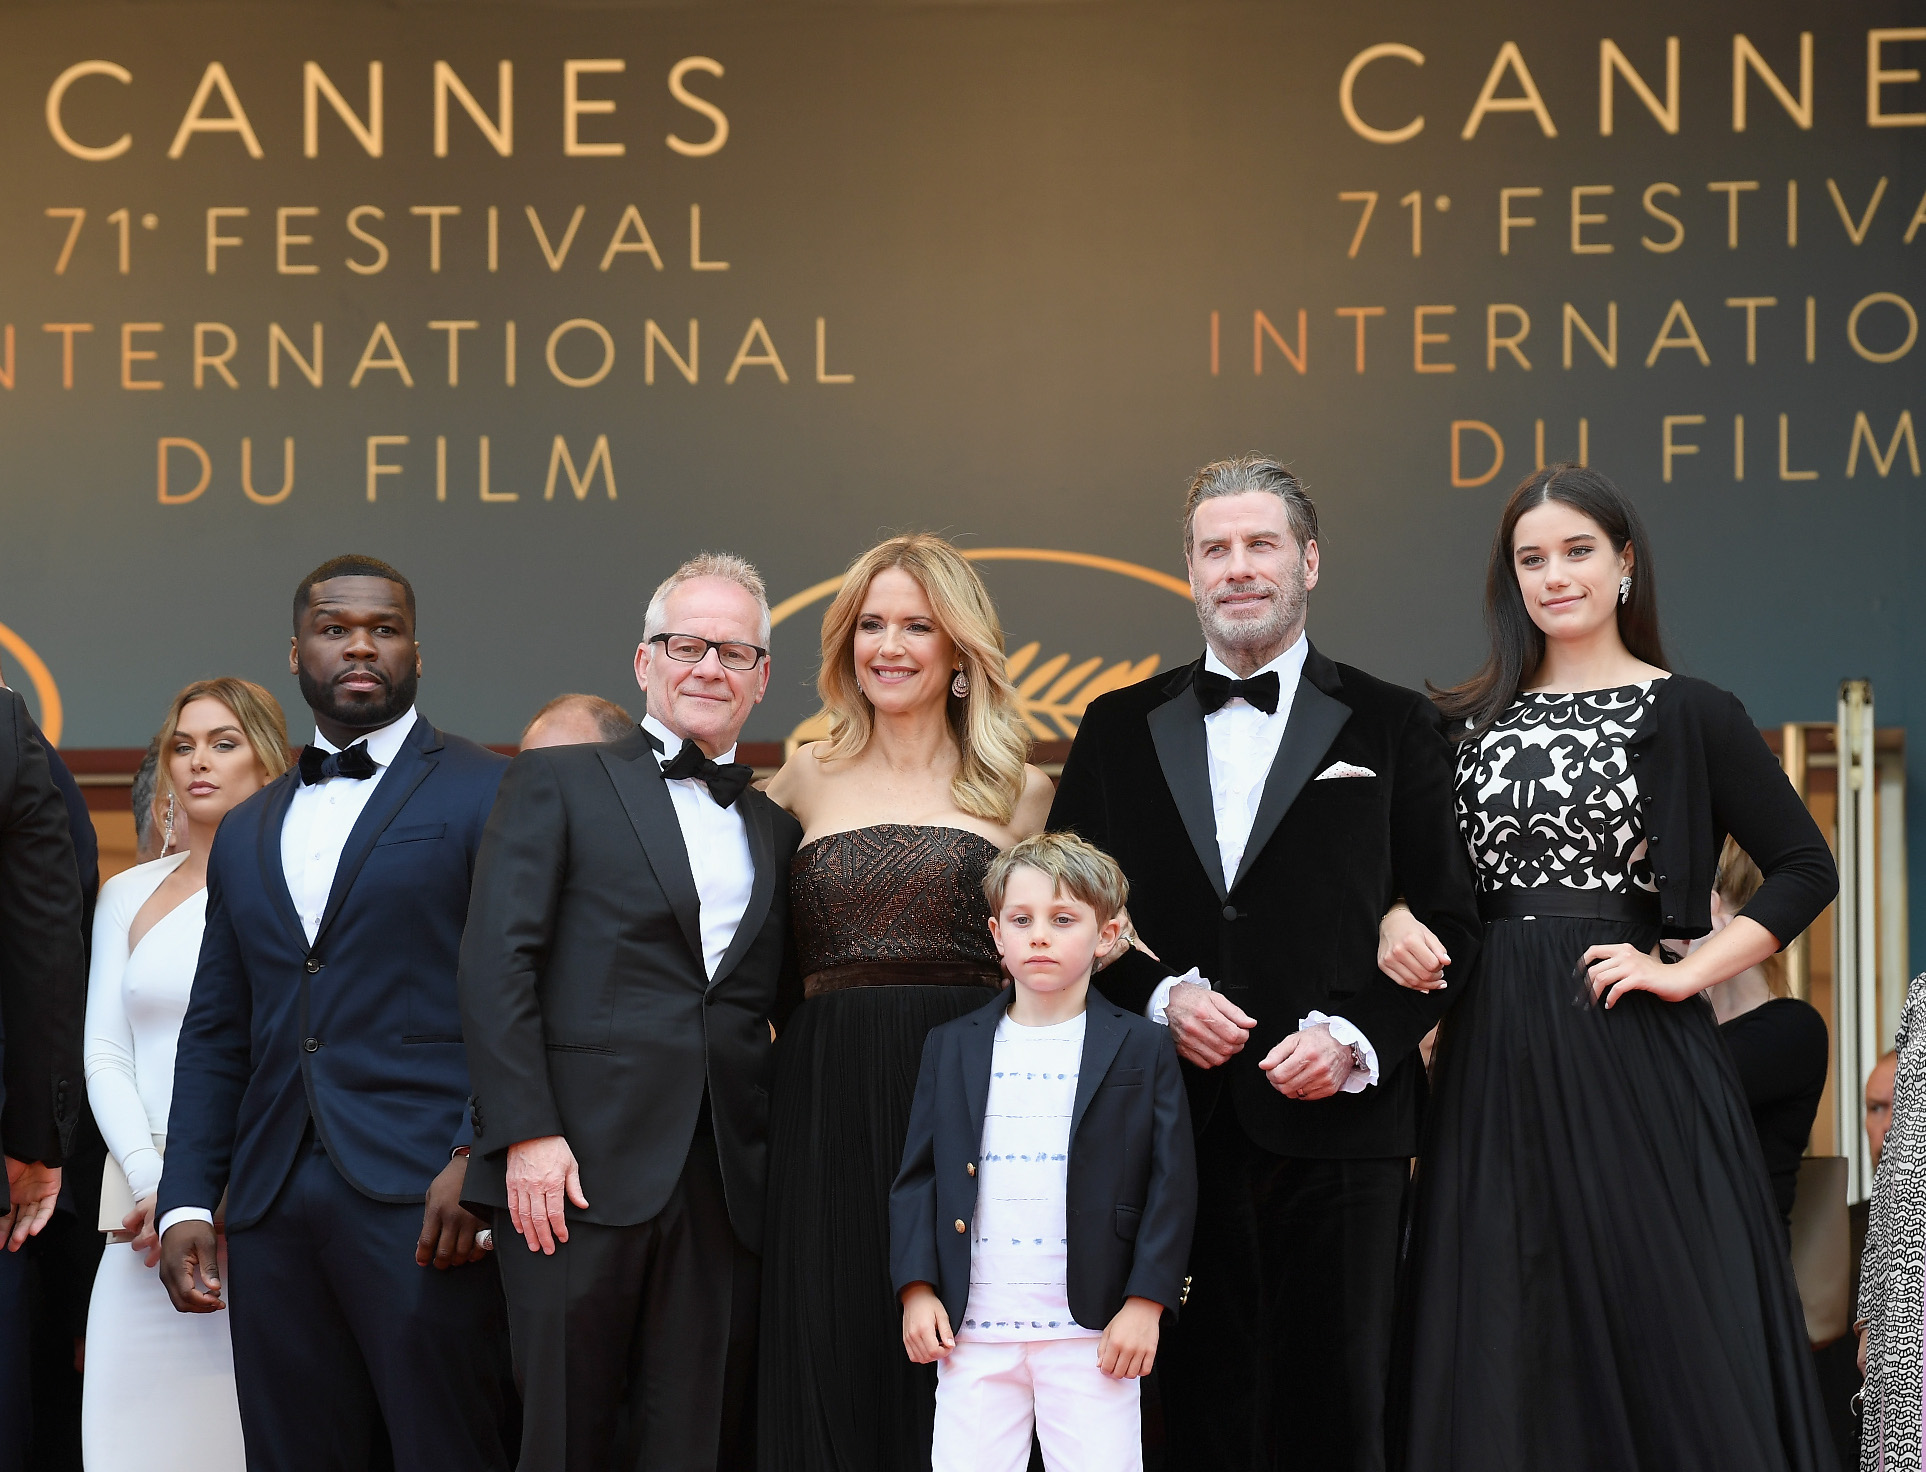 CANNES, FRANCE - MAY 15: (L-R) Curtis Jackson, Thierry Fremaux, Kelly Preston, Benjamin Travolta, John Travolta and Ella Travolta attend the screening of